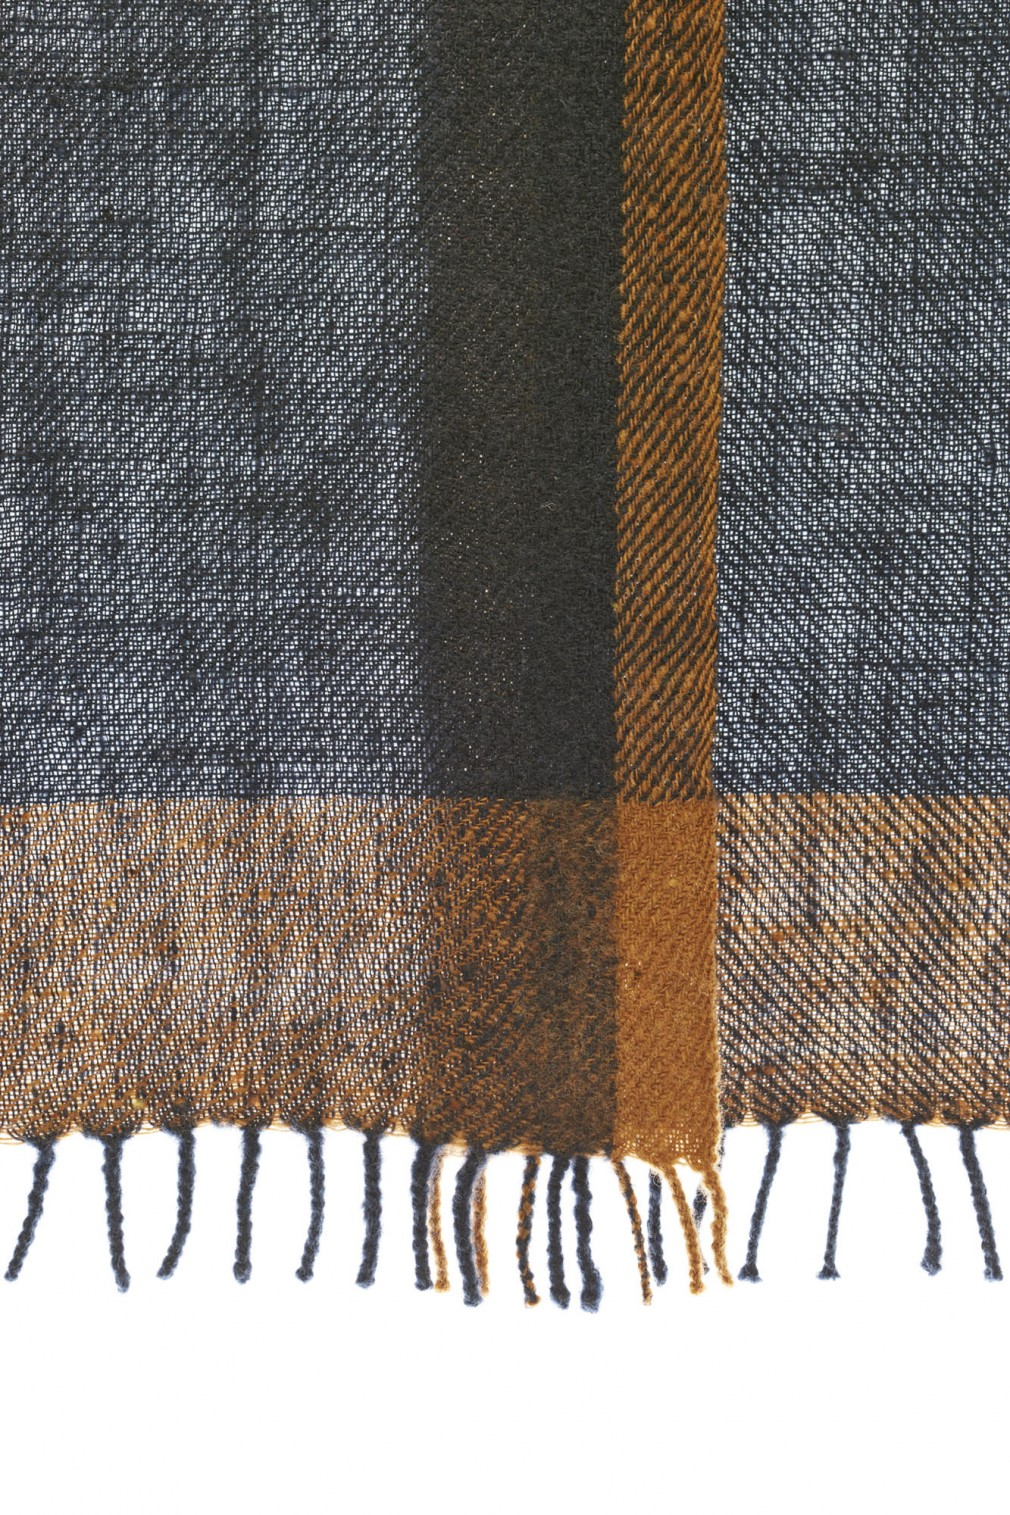 Art and Textile Workshop [homespun] × Cecilie Manz